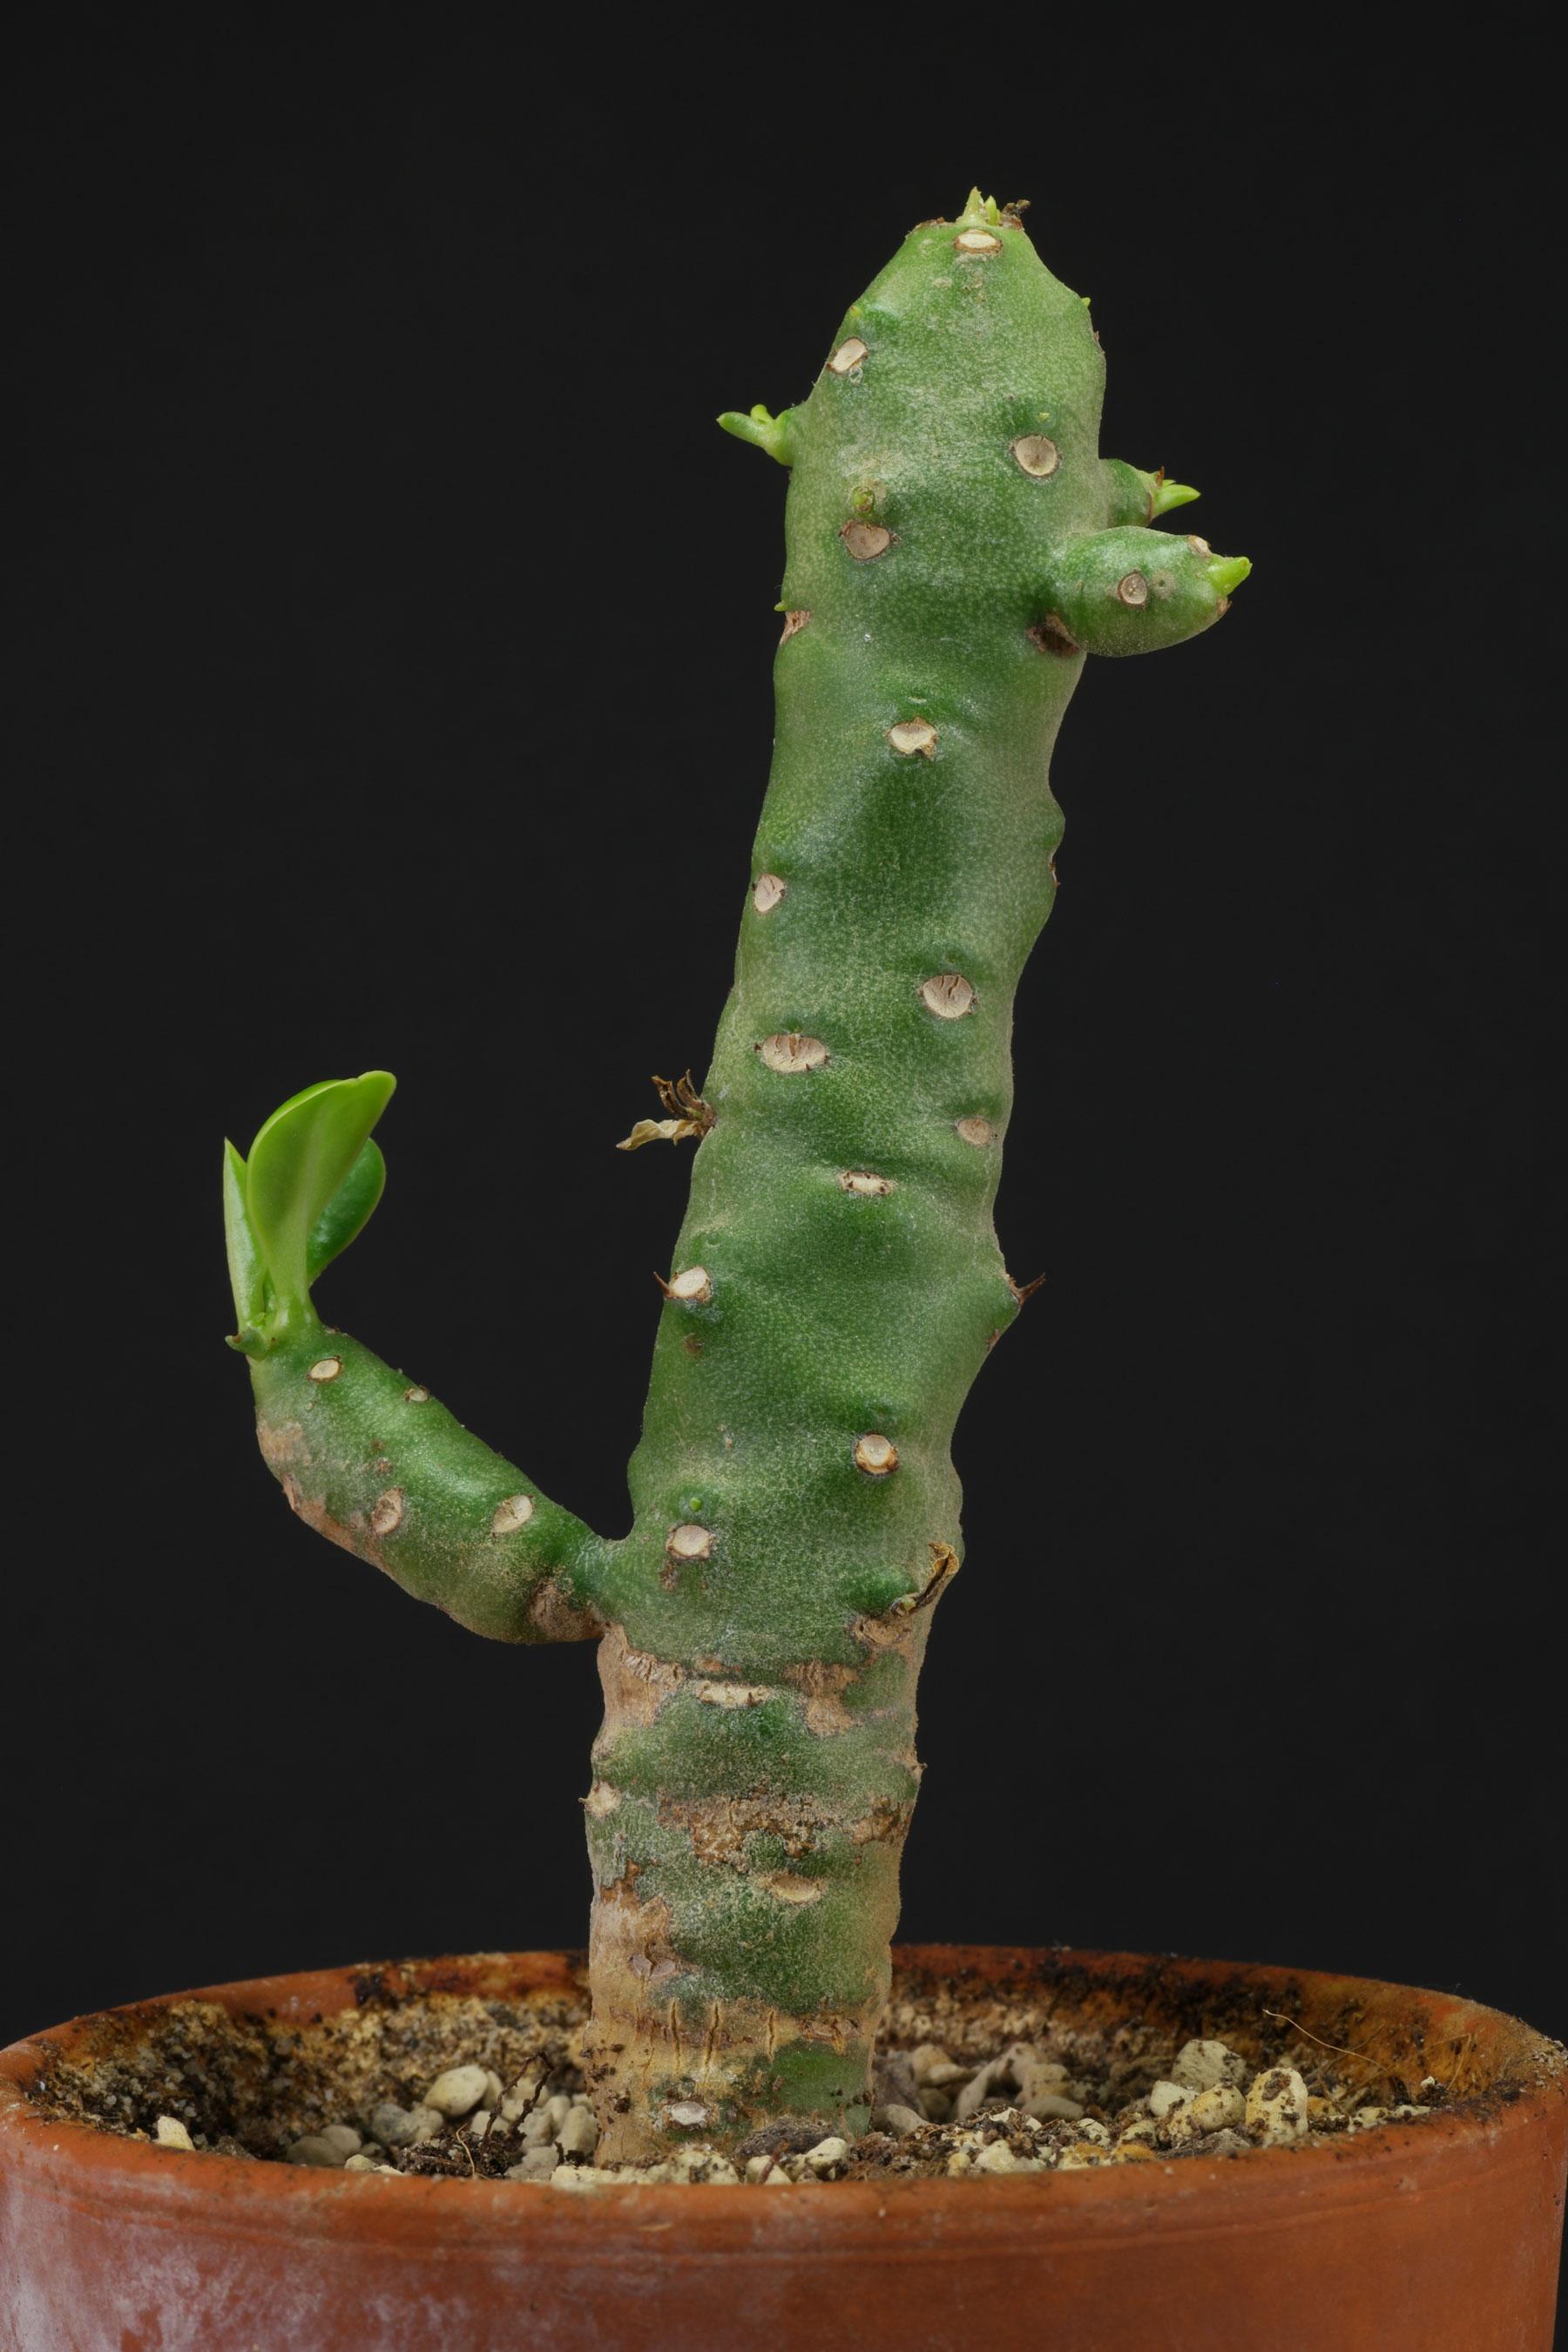 Euphorbia nivulia Stamm